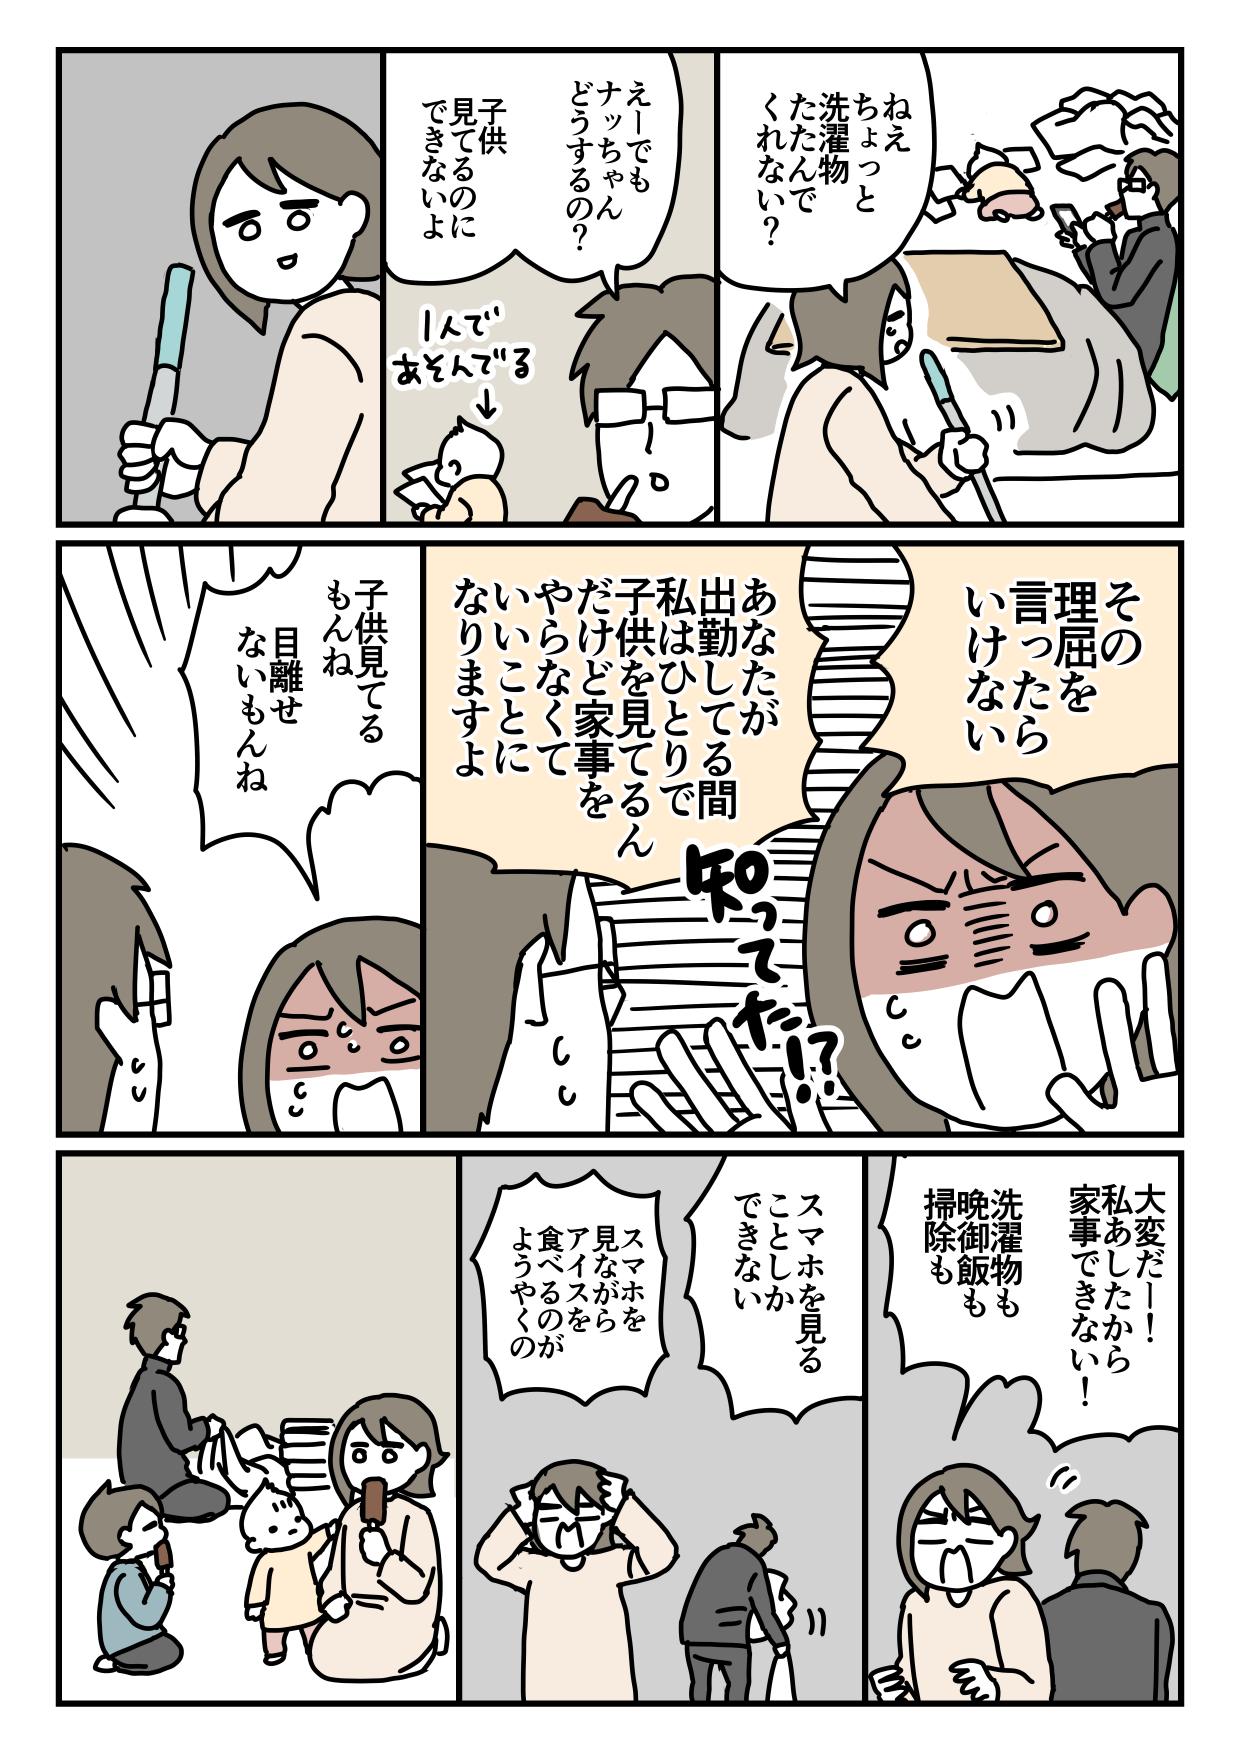 f:id:kanemotonomukuu:20171028204943j:plain